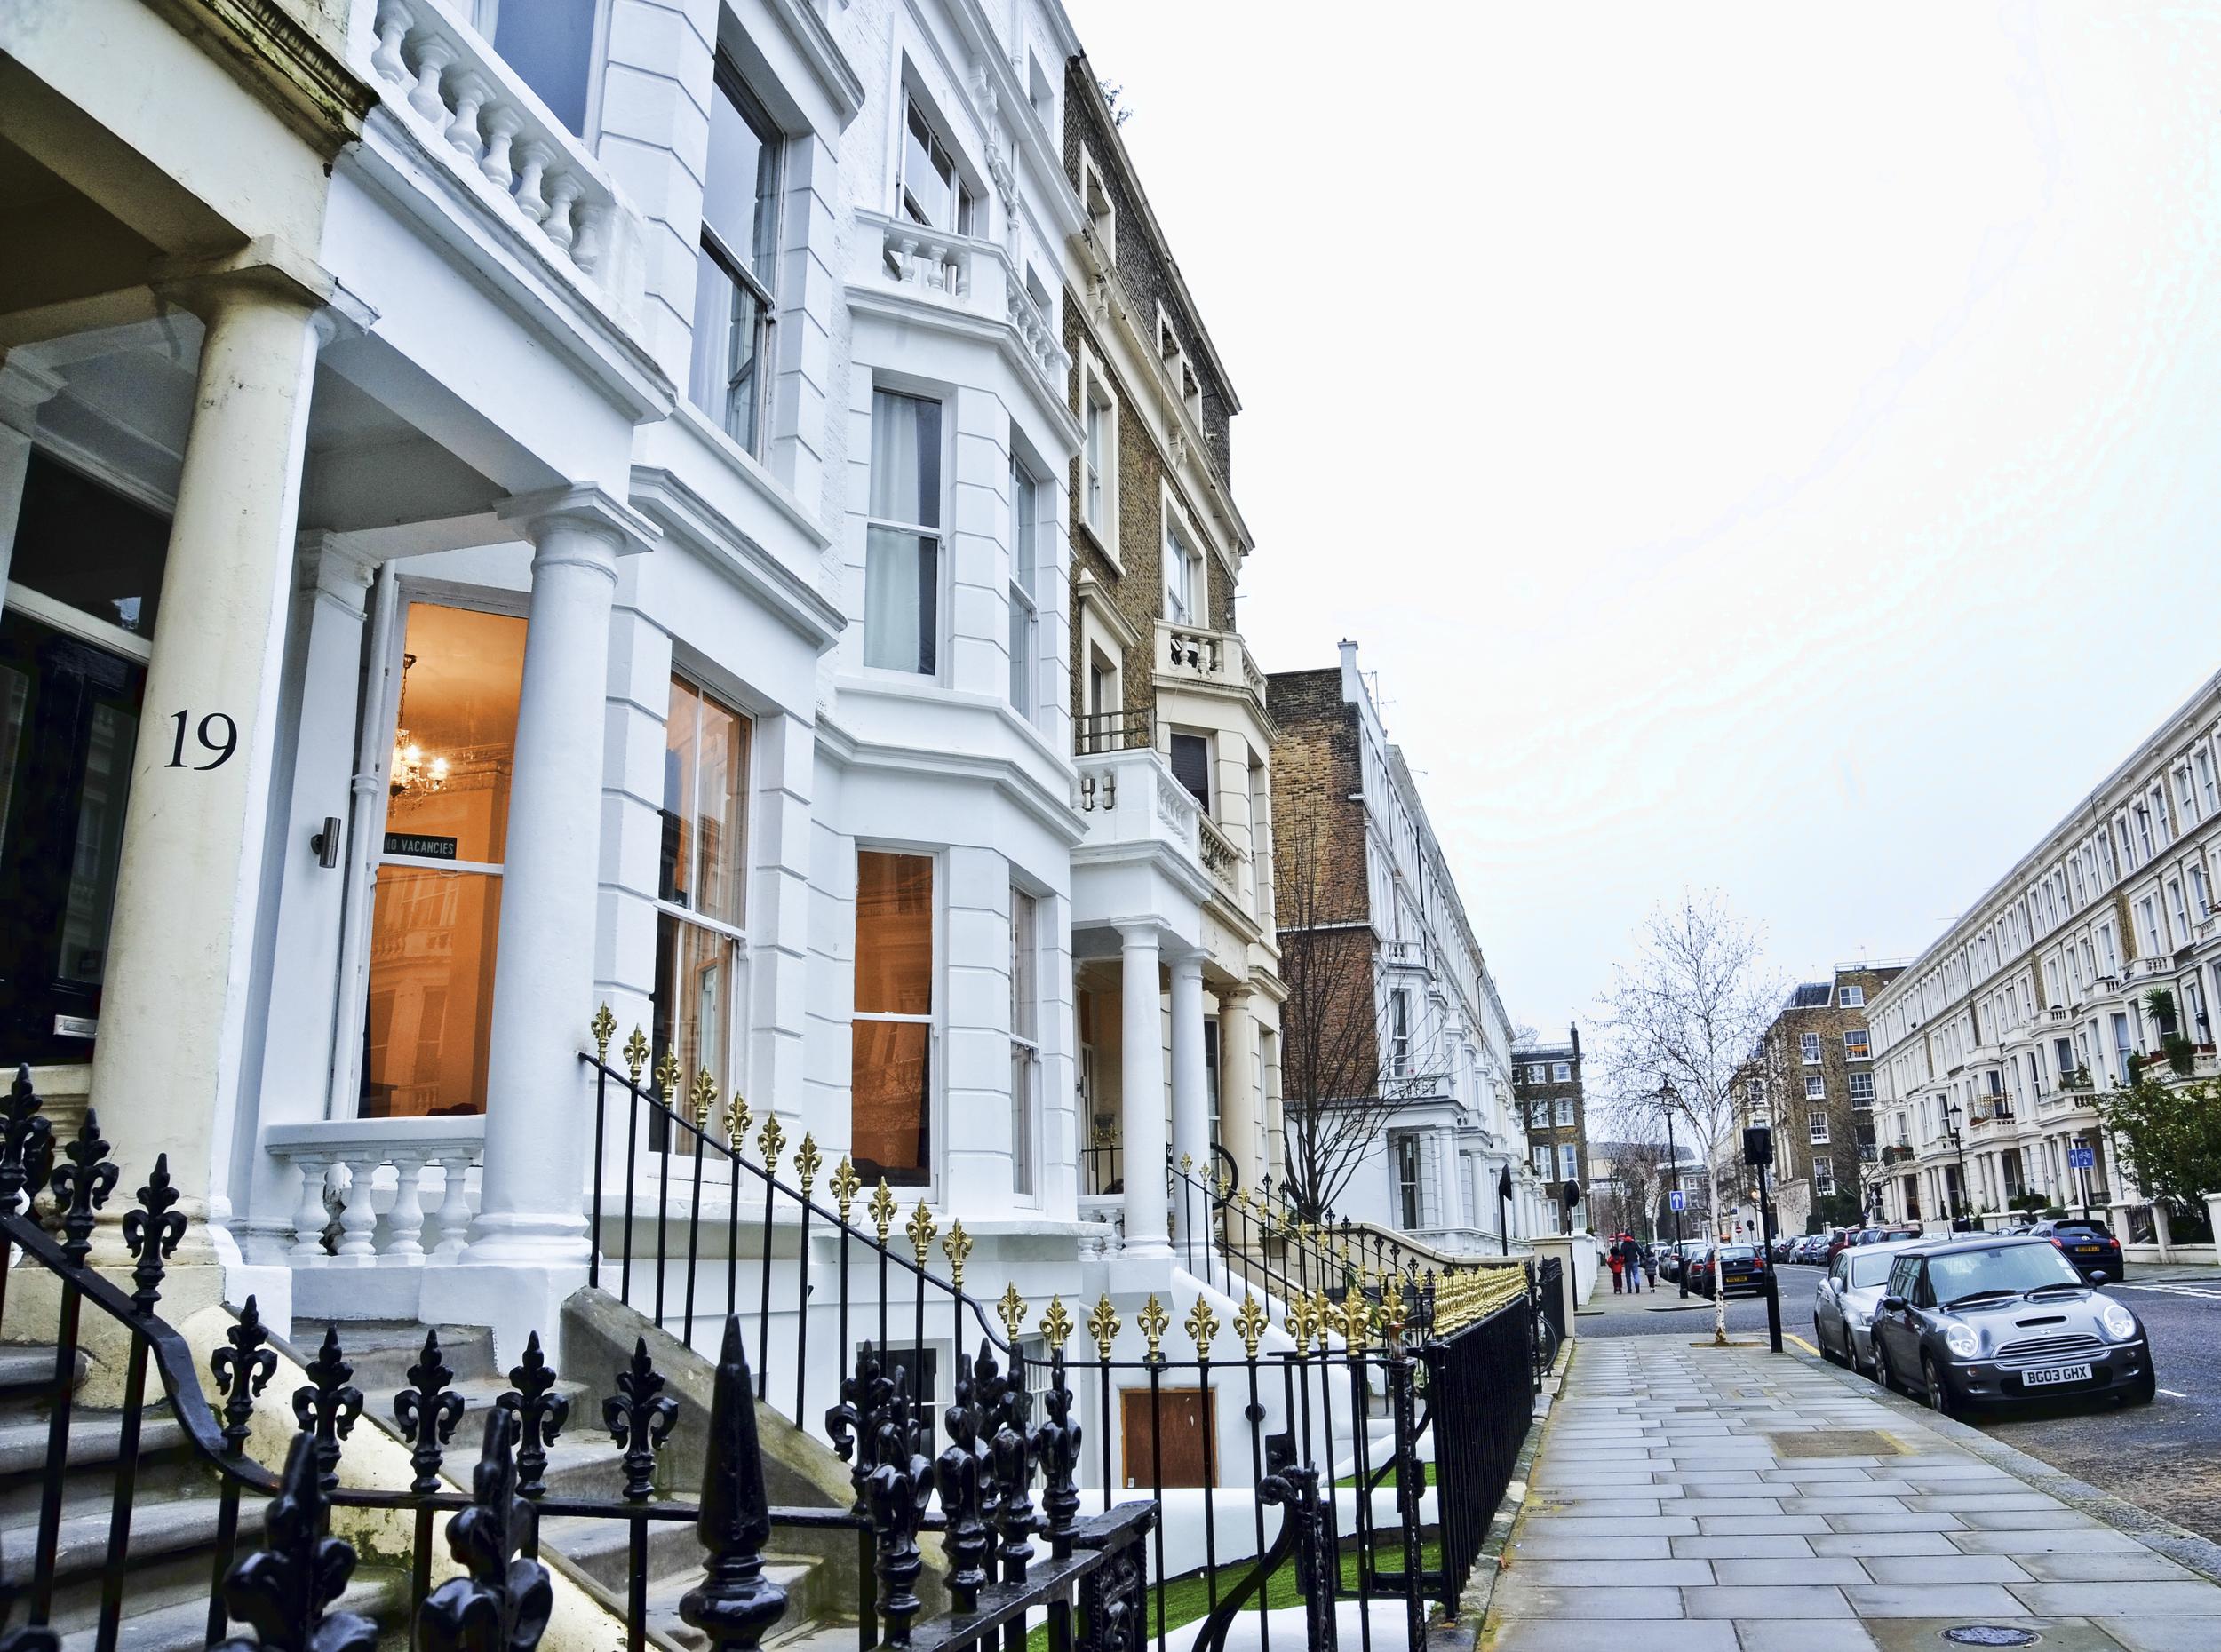 london-hostel-street-view.jpg